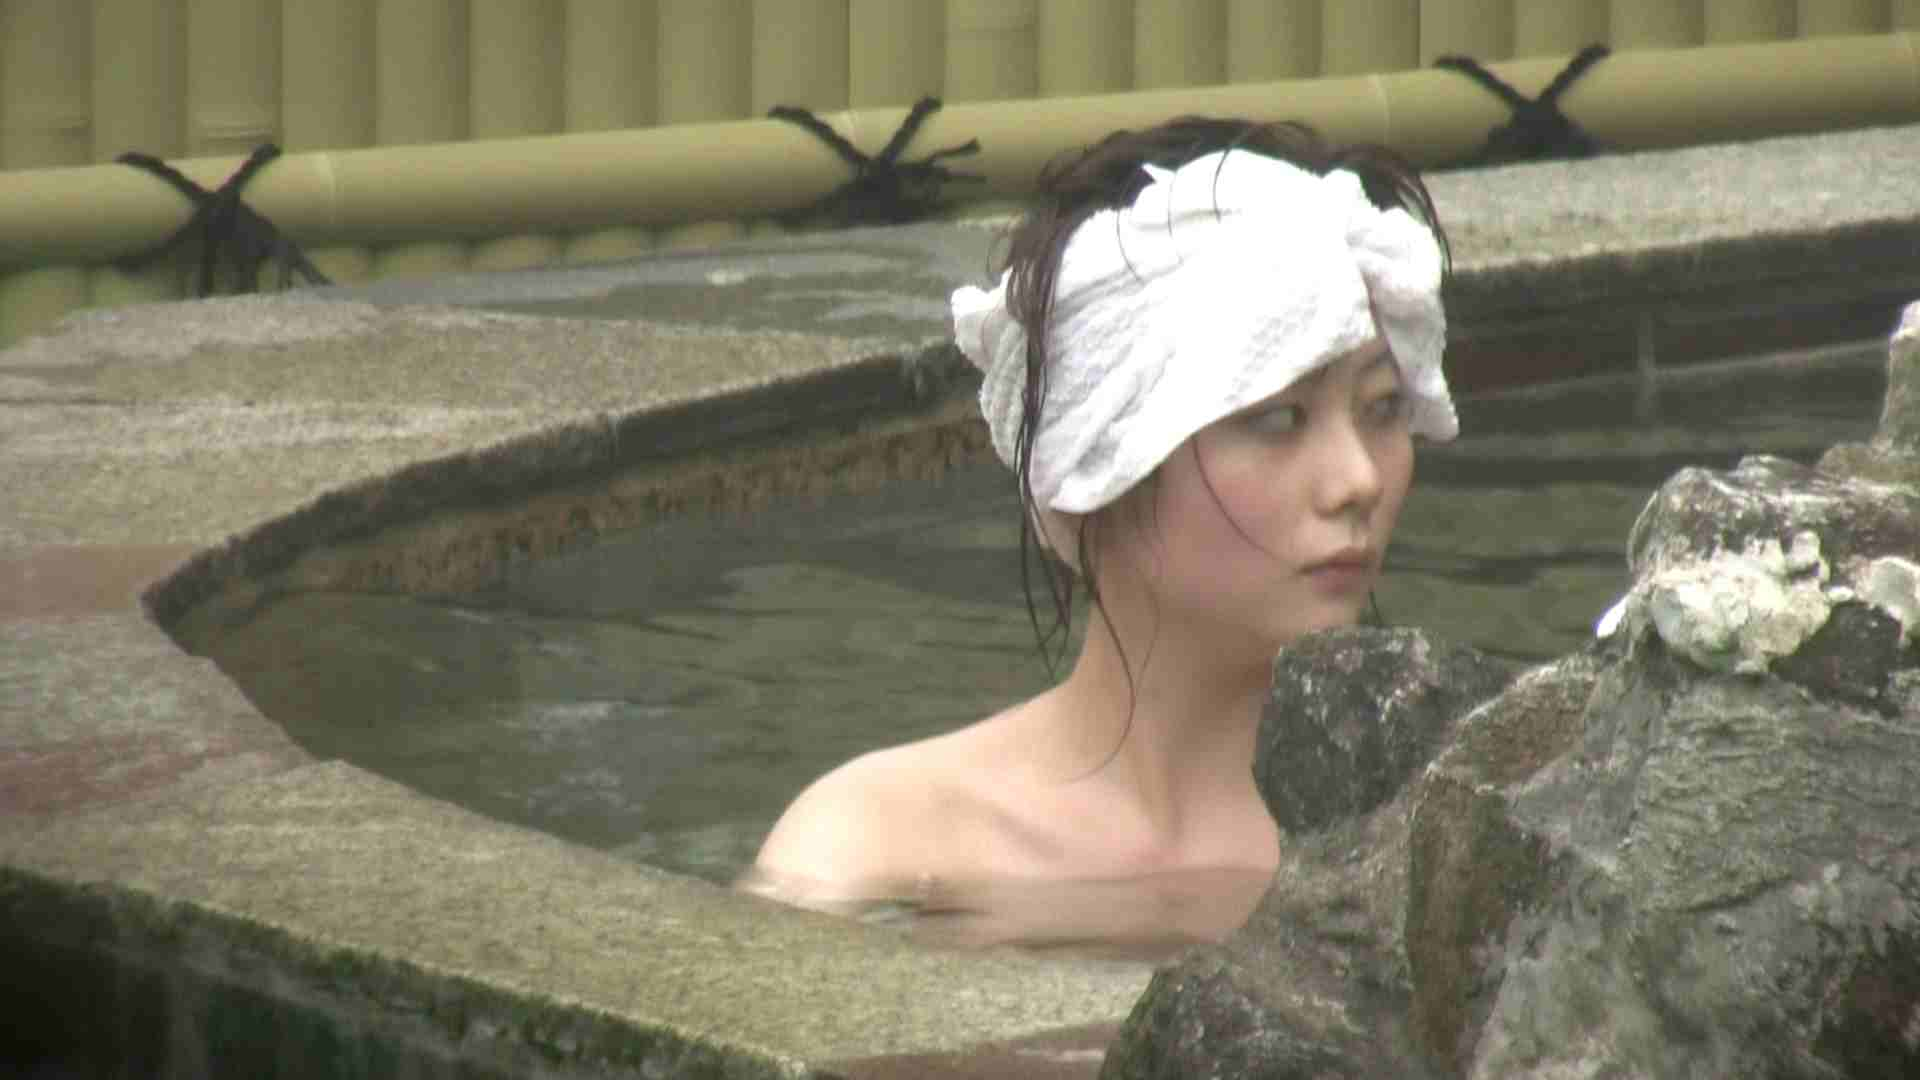 Aquaな露天風呂Vol.147 露天 濡れ場動画紹介 85画像 38